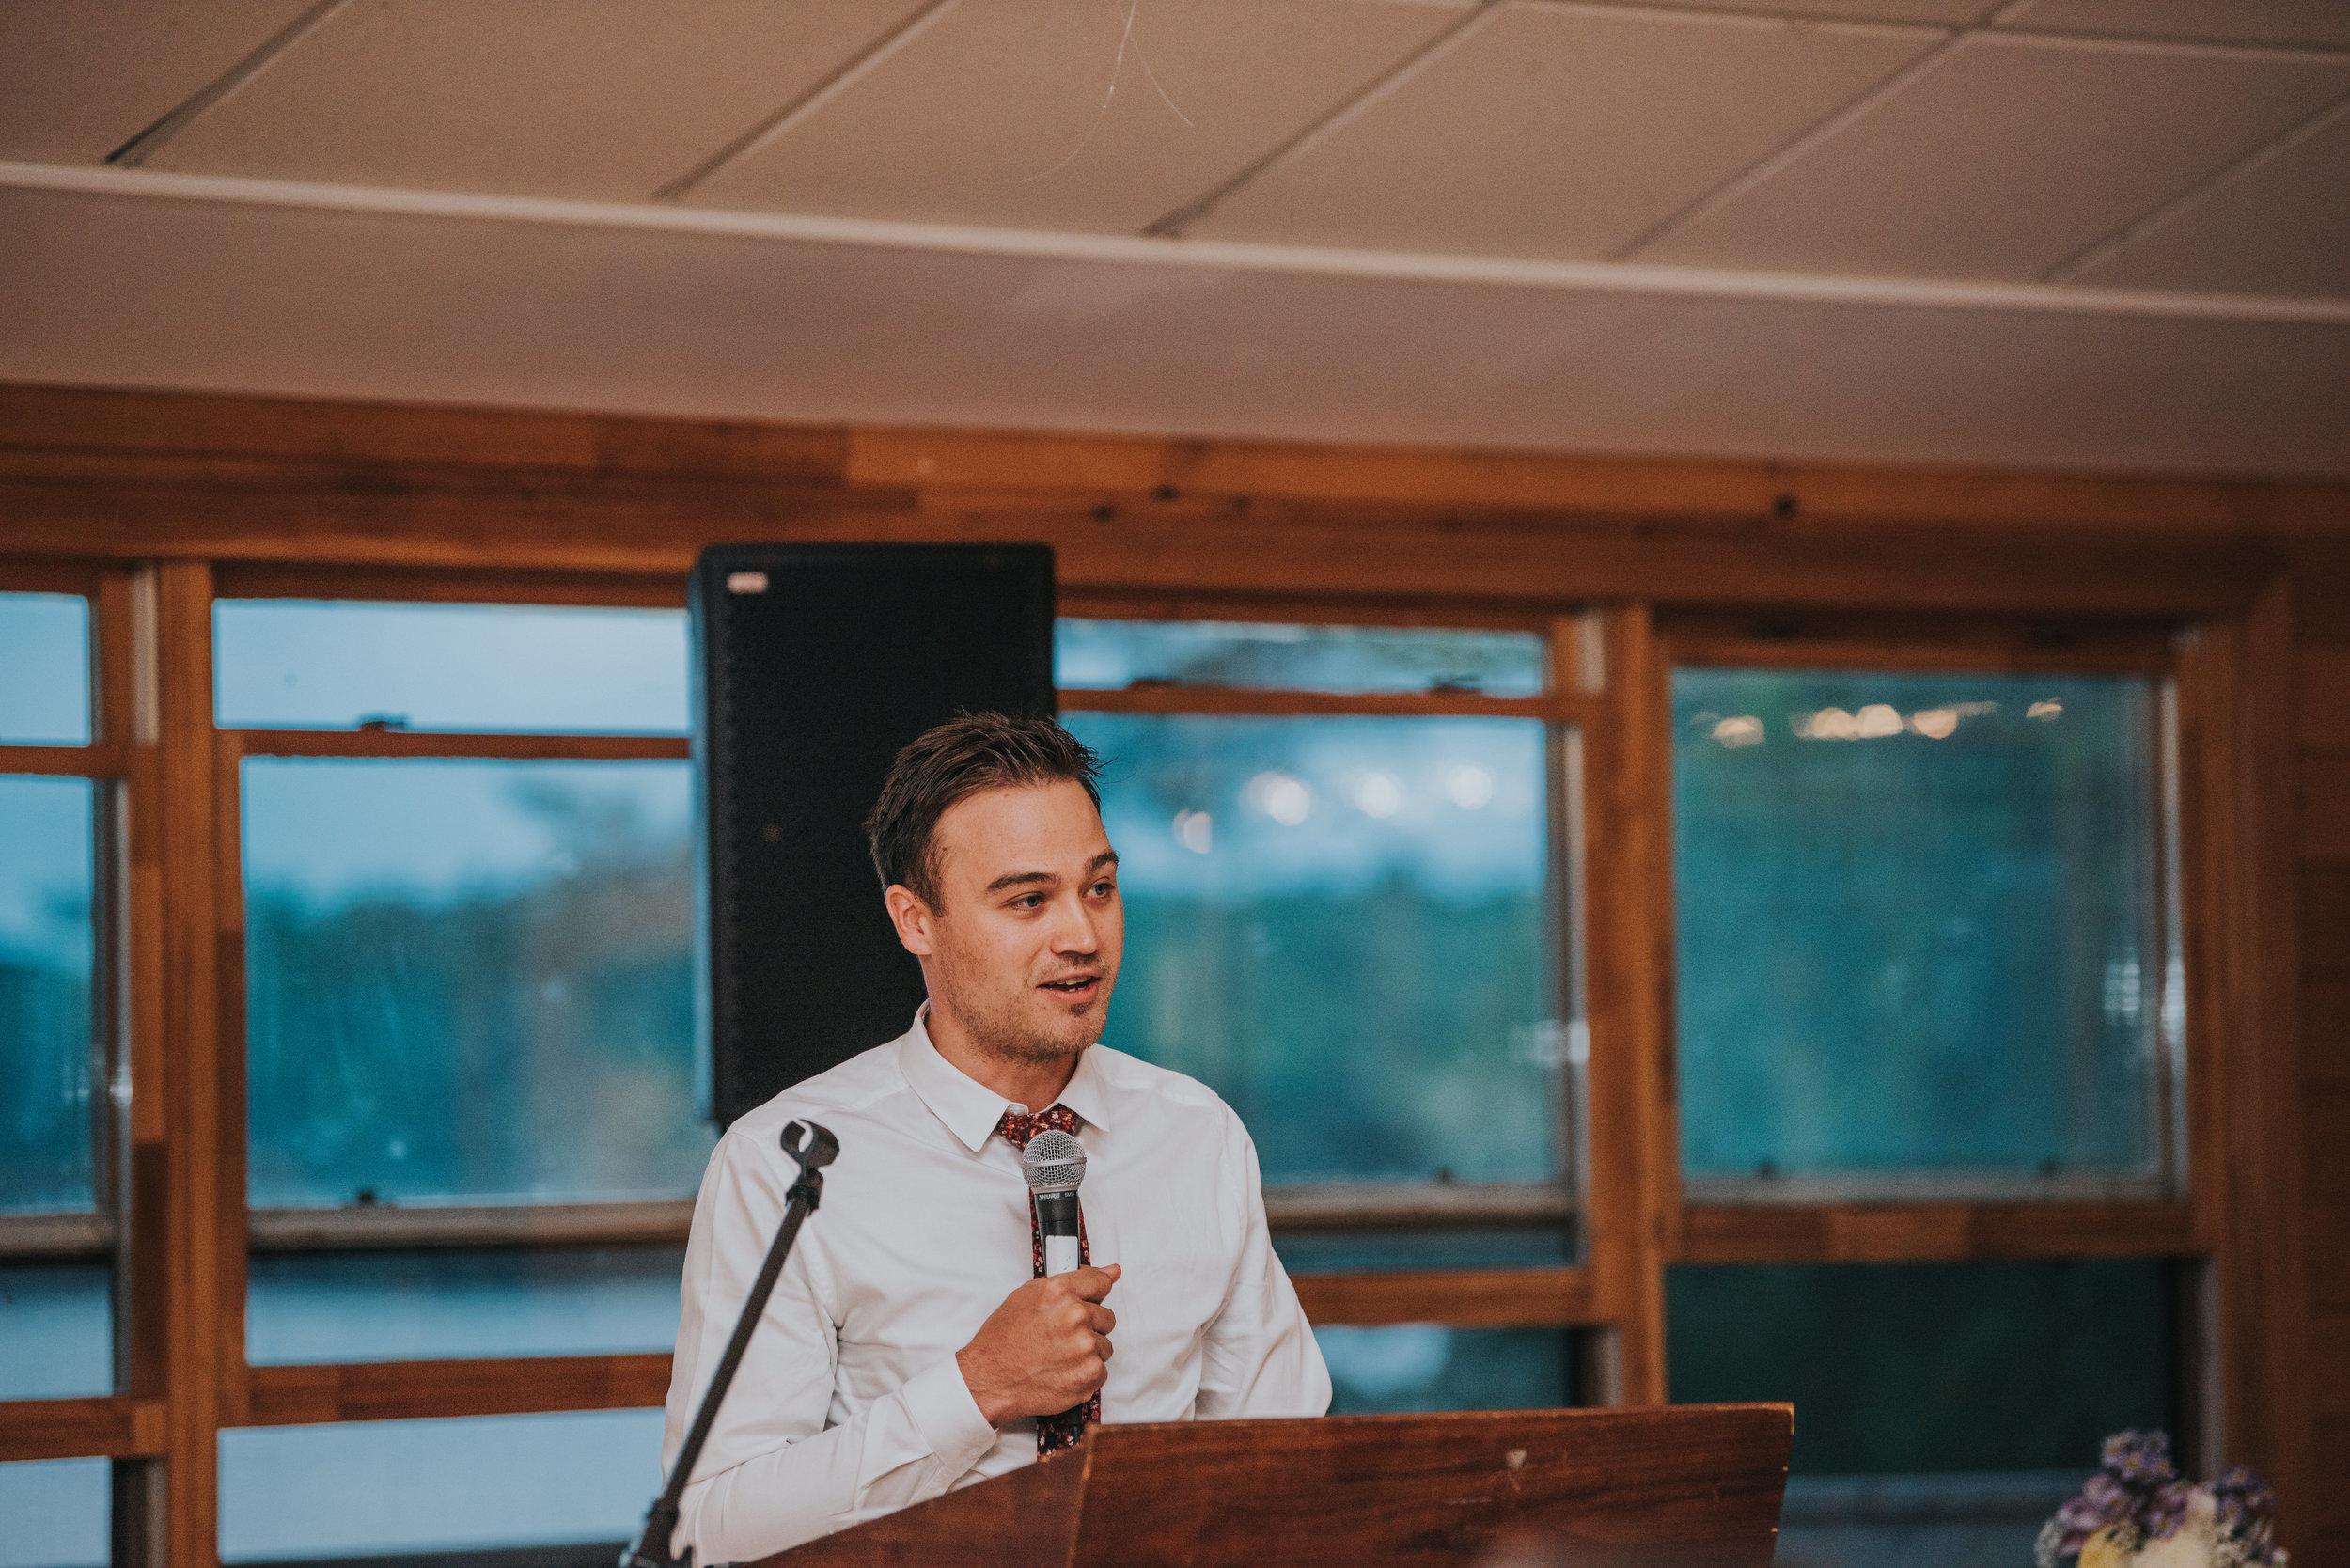 rustic-cabin-wedding-reception-speeches-toronto-bohemian-boho-outdoor-summer-wedding-documentary-wedding-photography-by-willow-birch-photo.jpg